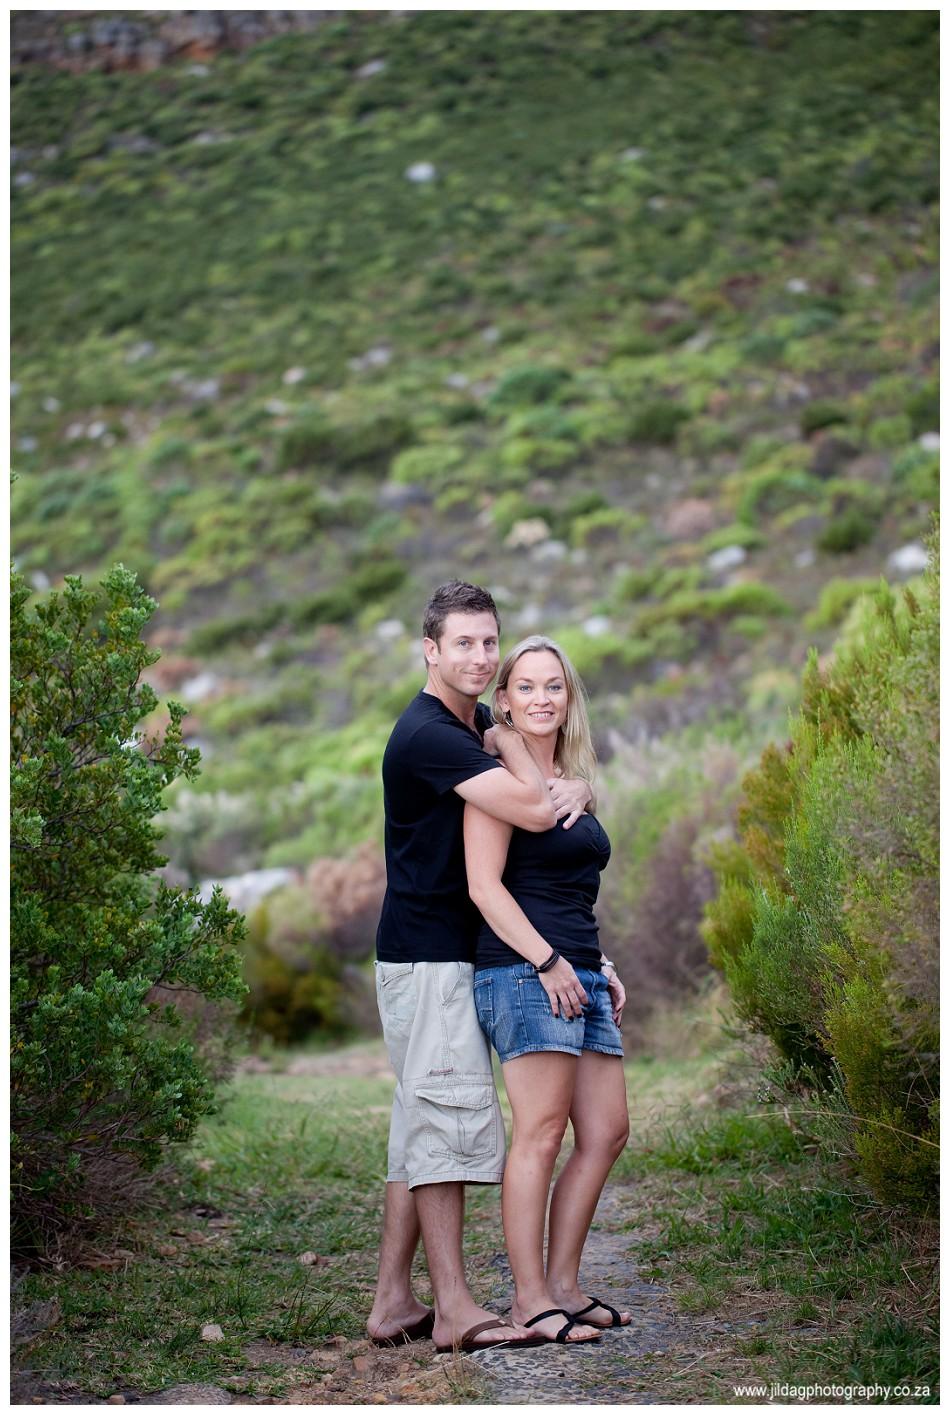 Engagement shoot - Hout Bay - Jilda G Photography (17)